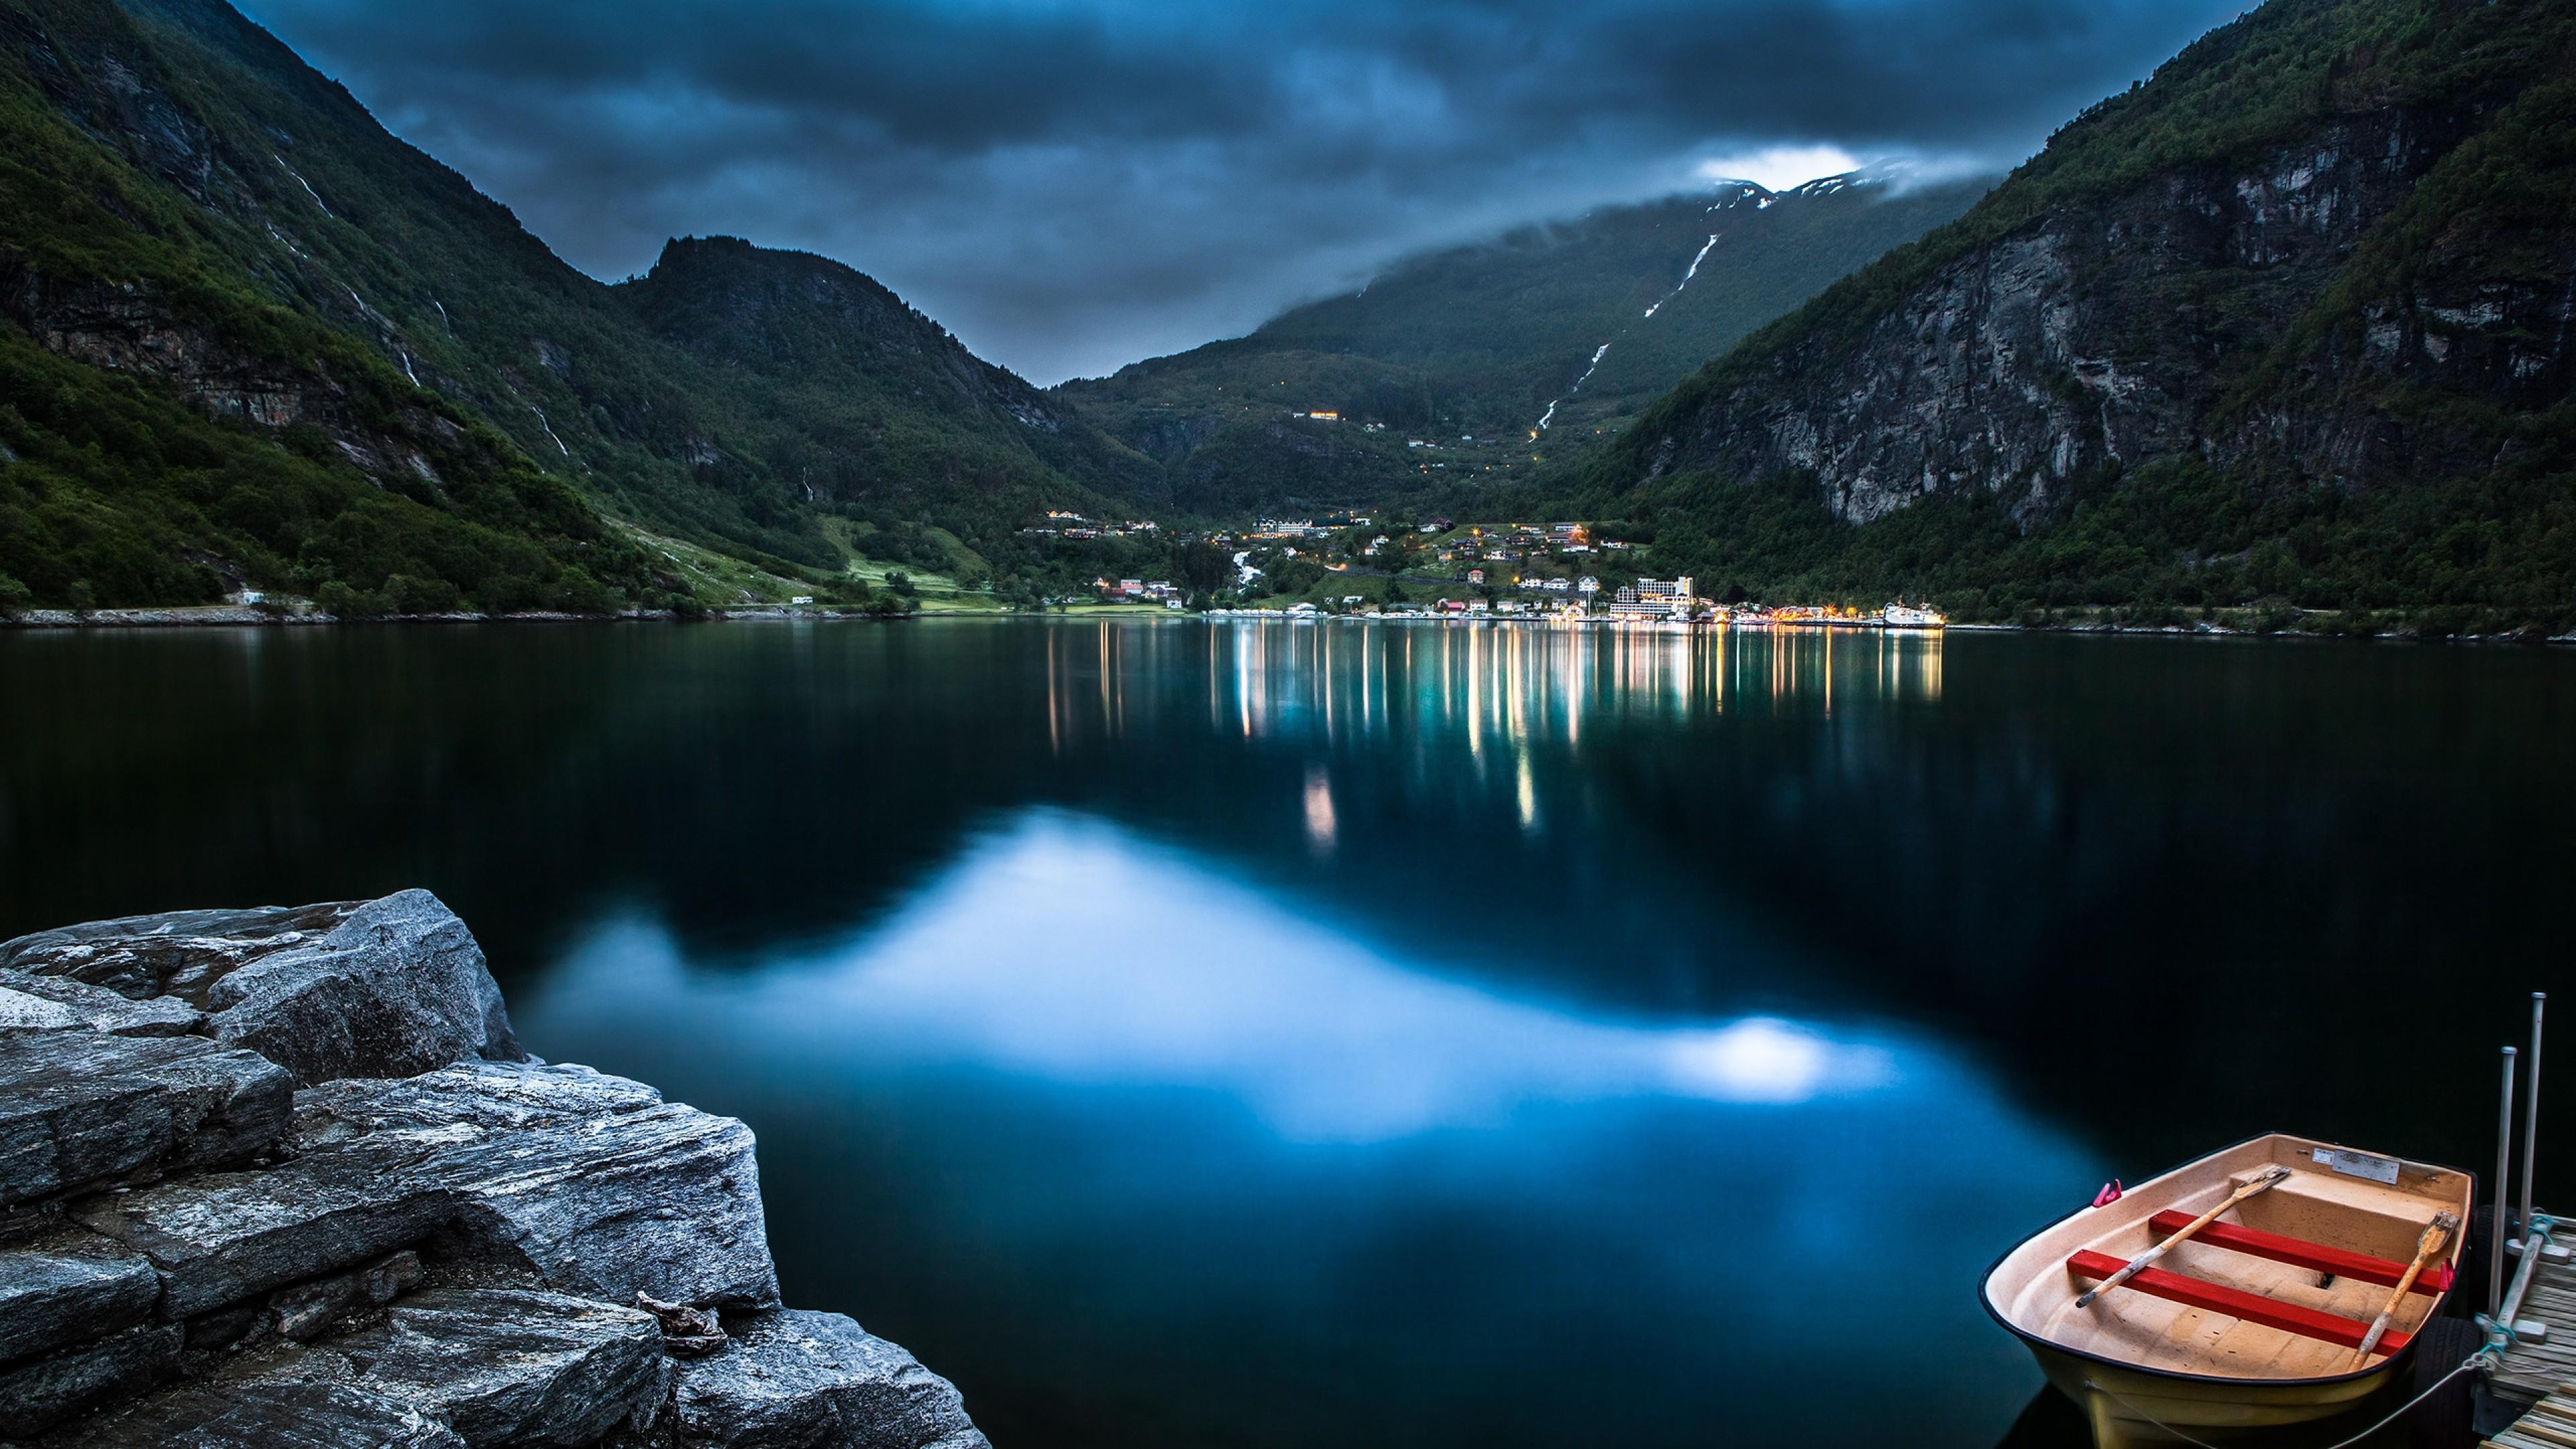 Amazing Wallpaper Mountain Nokia - mountain-lake-beautiful-night  2018_303911.jpg